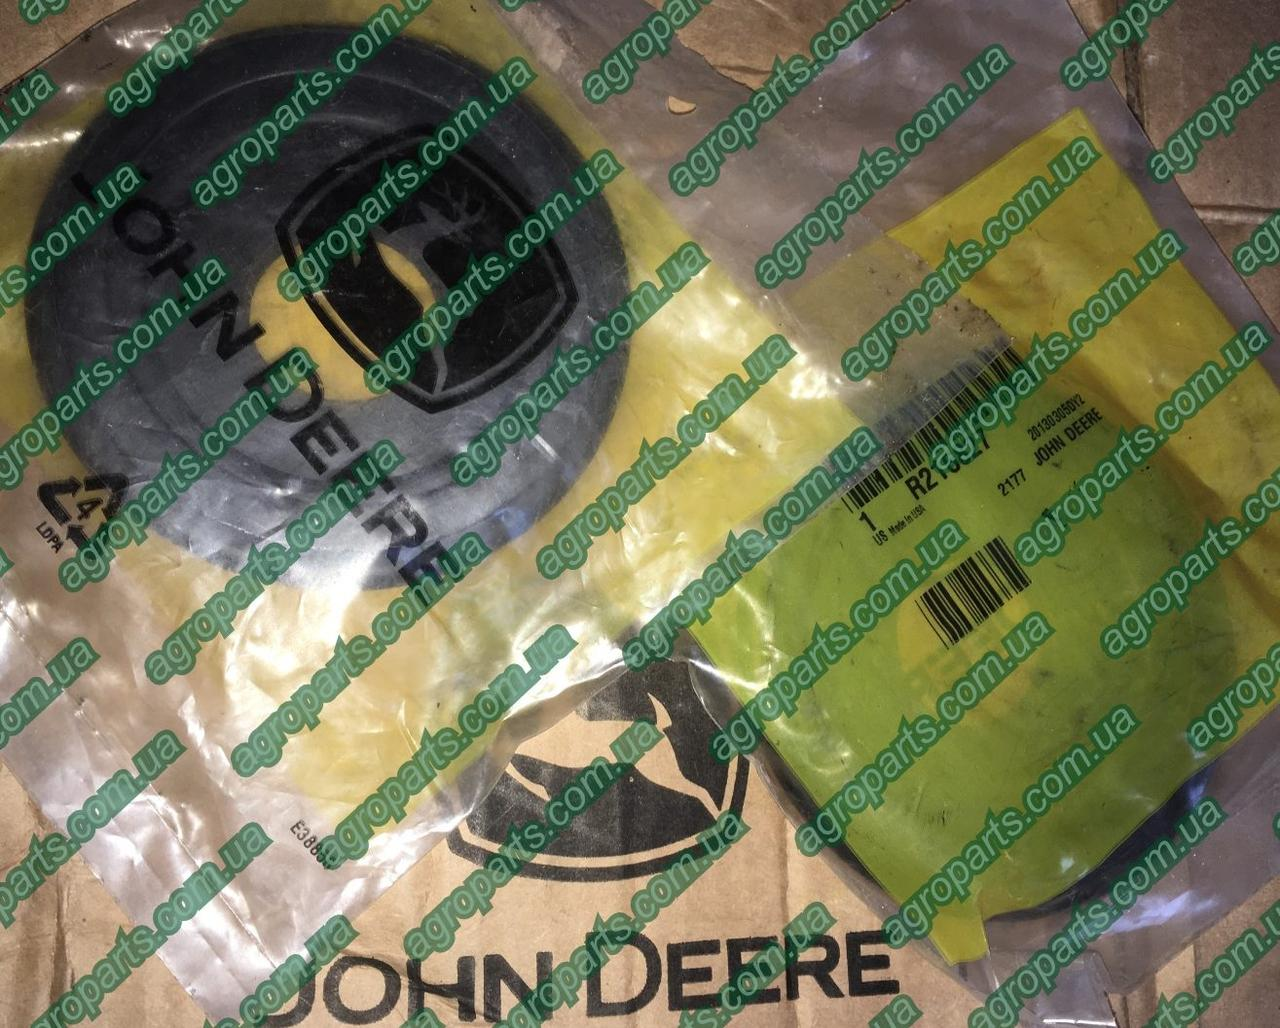 Пыльник R216827 шарнира John Deere BOOT, ILS BALL JOINT&OUTER TIEROD r216827